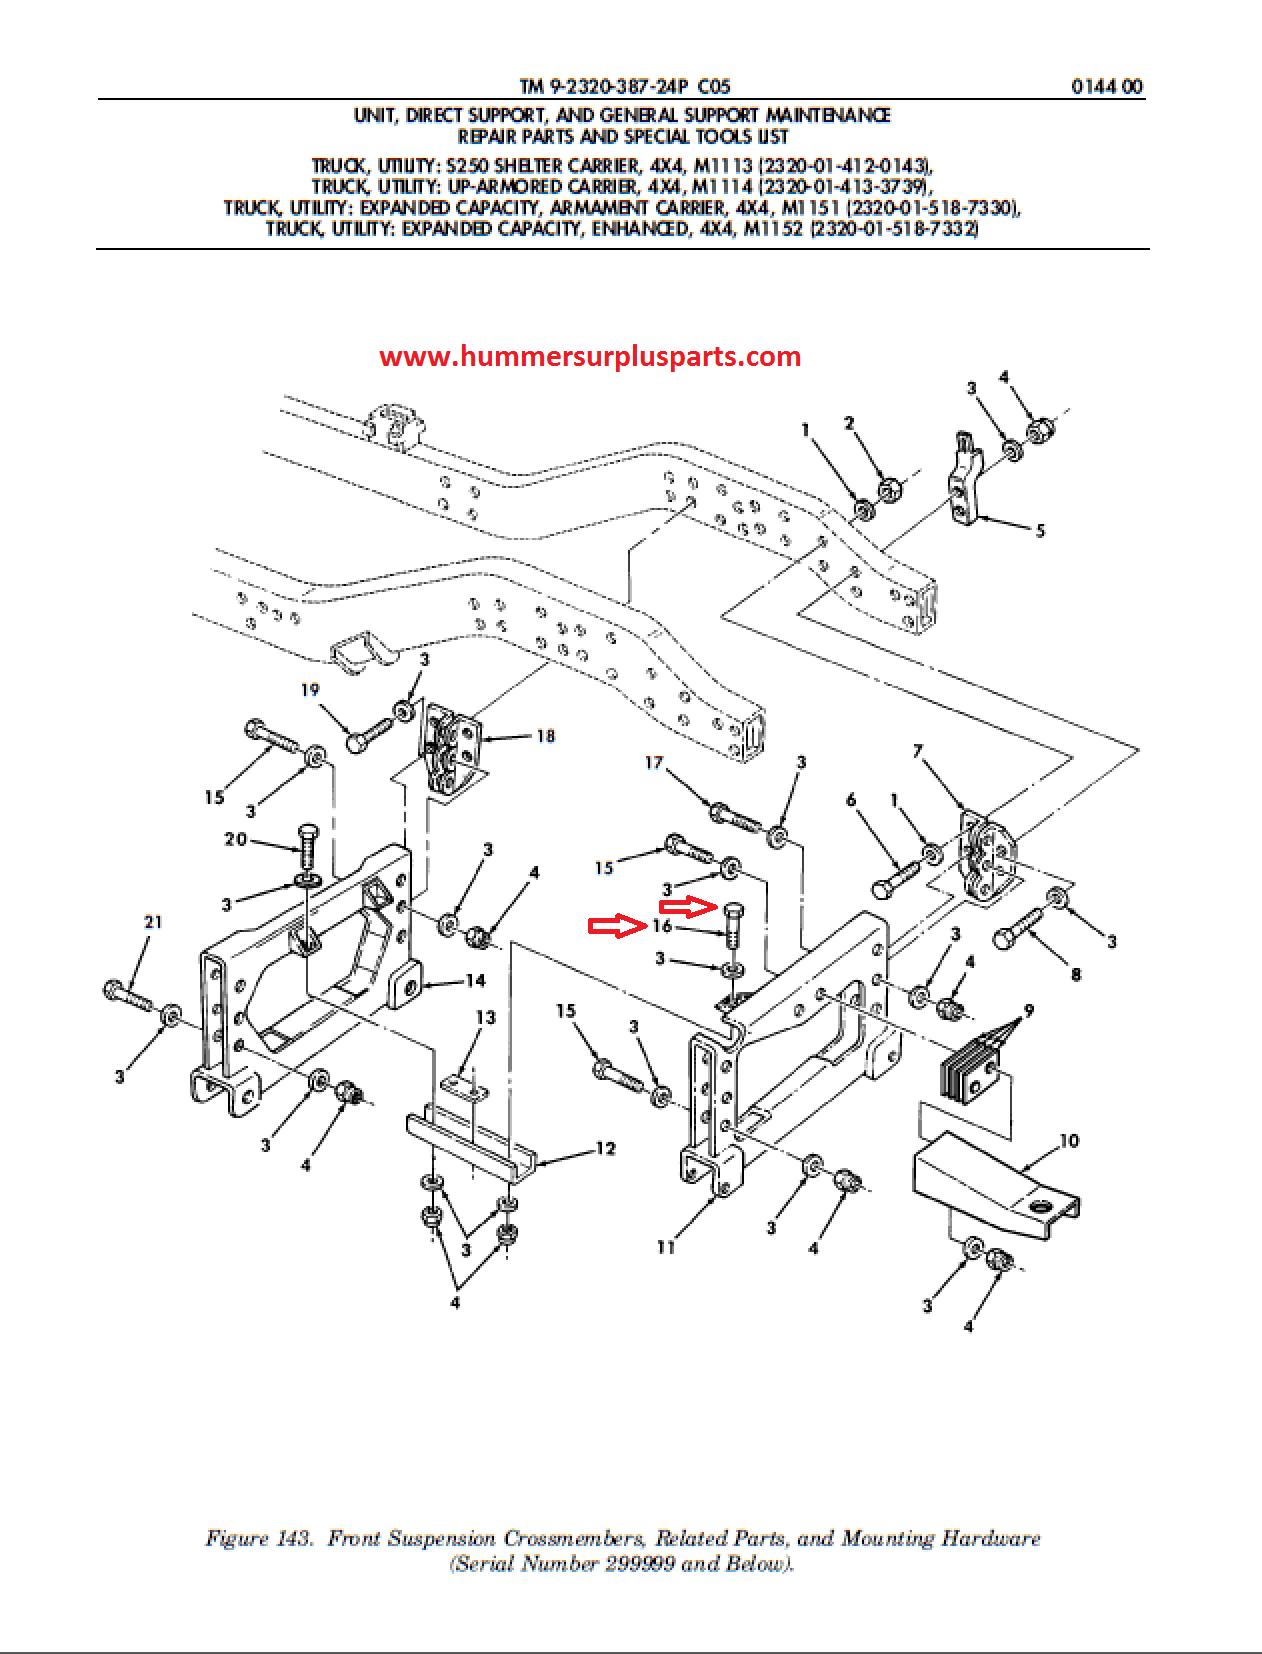 HMMWV SCREW CAP HEXAGON H 1/2-13 X 1.25 B1821BH050C125N